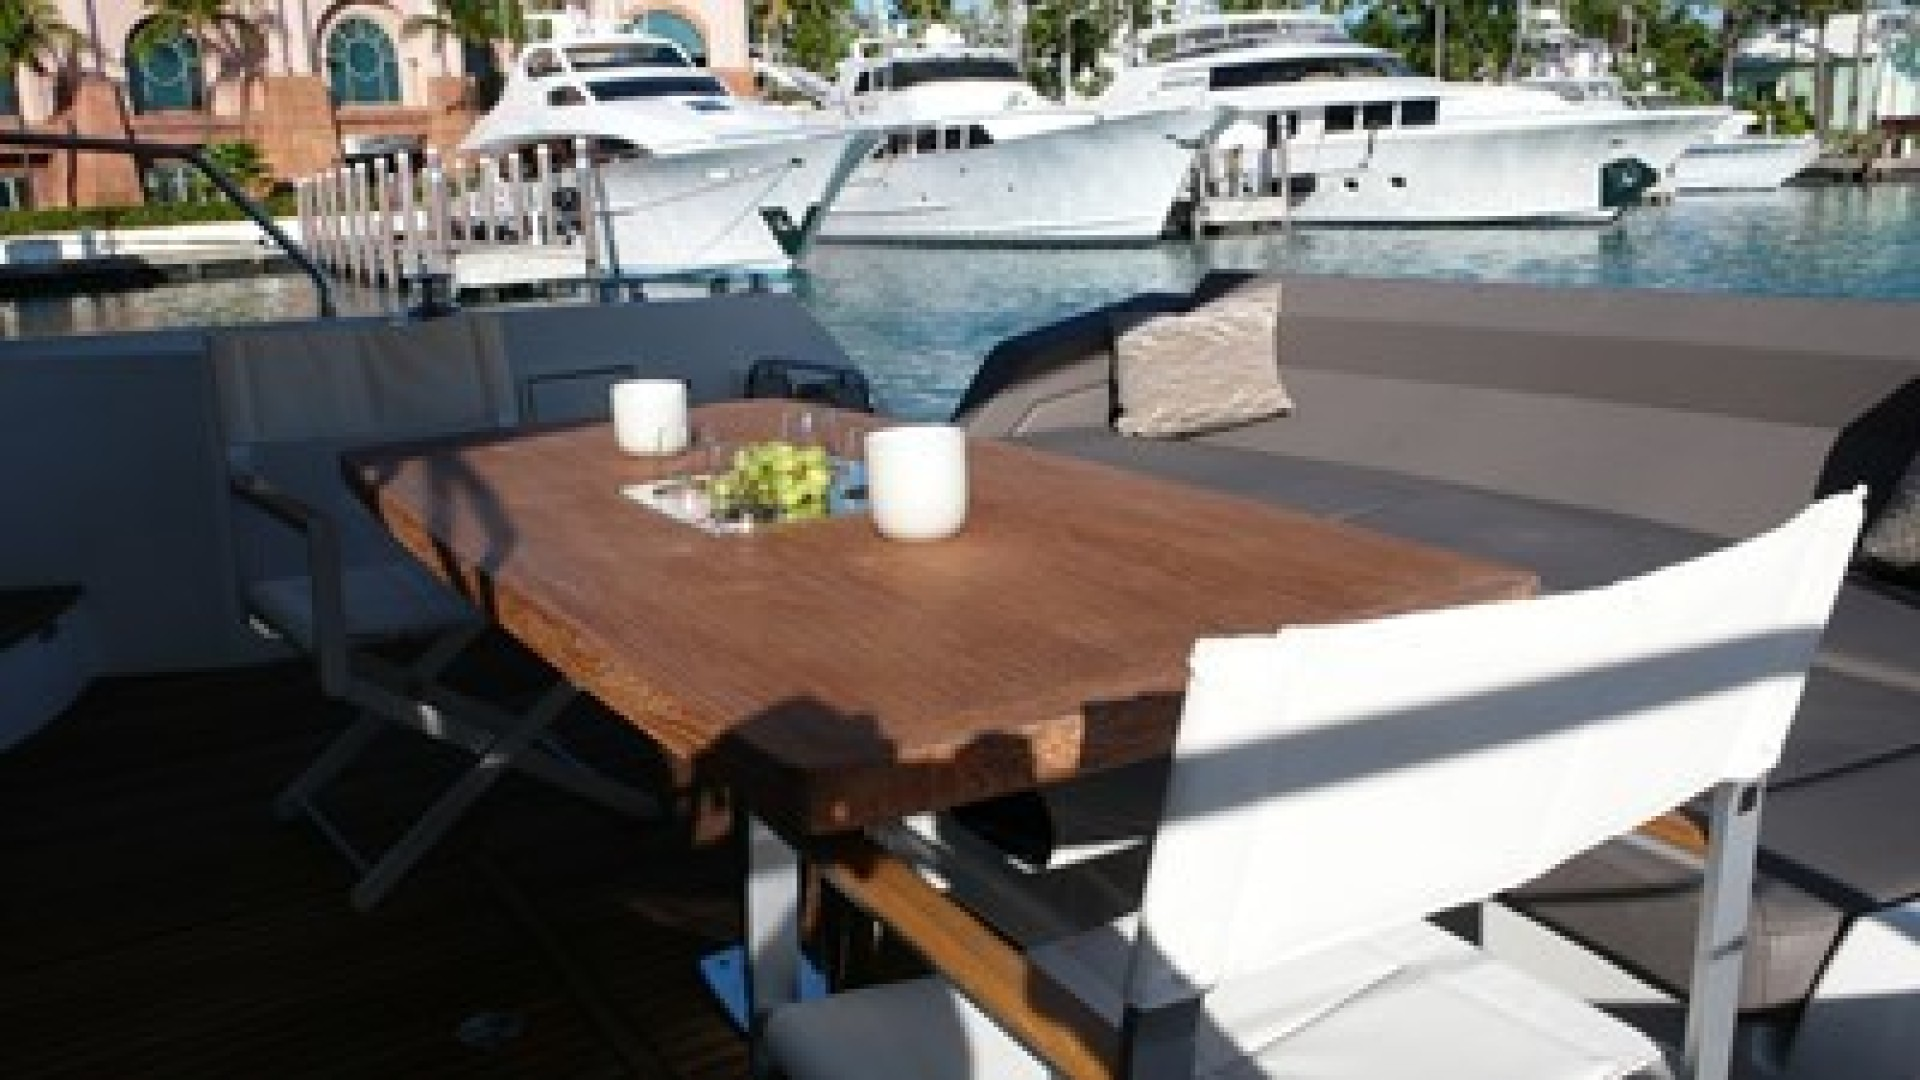 Prestige 2016 -Bahamas-1500062 | Thumbnail